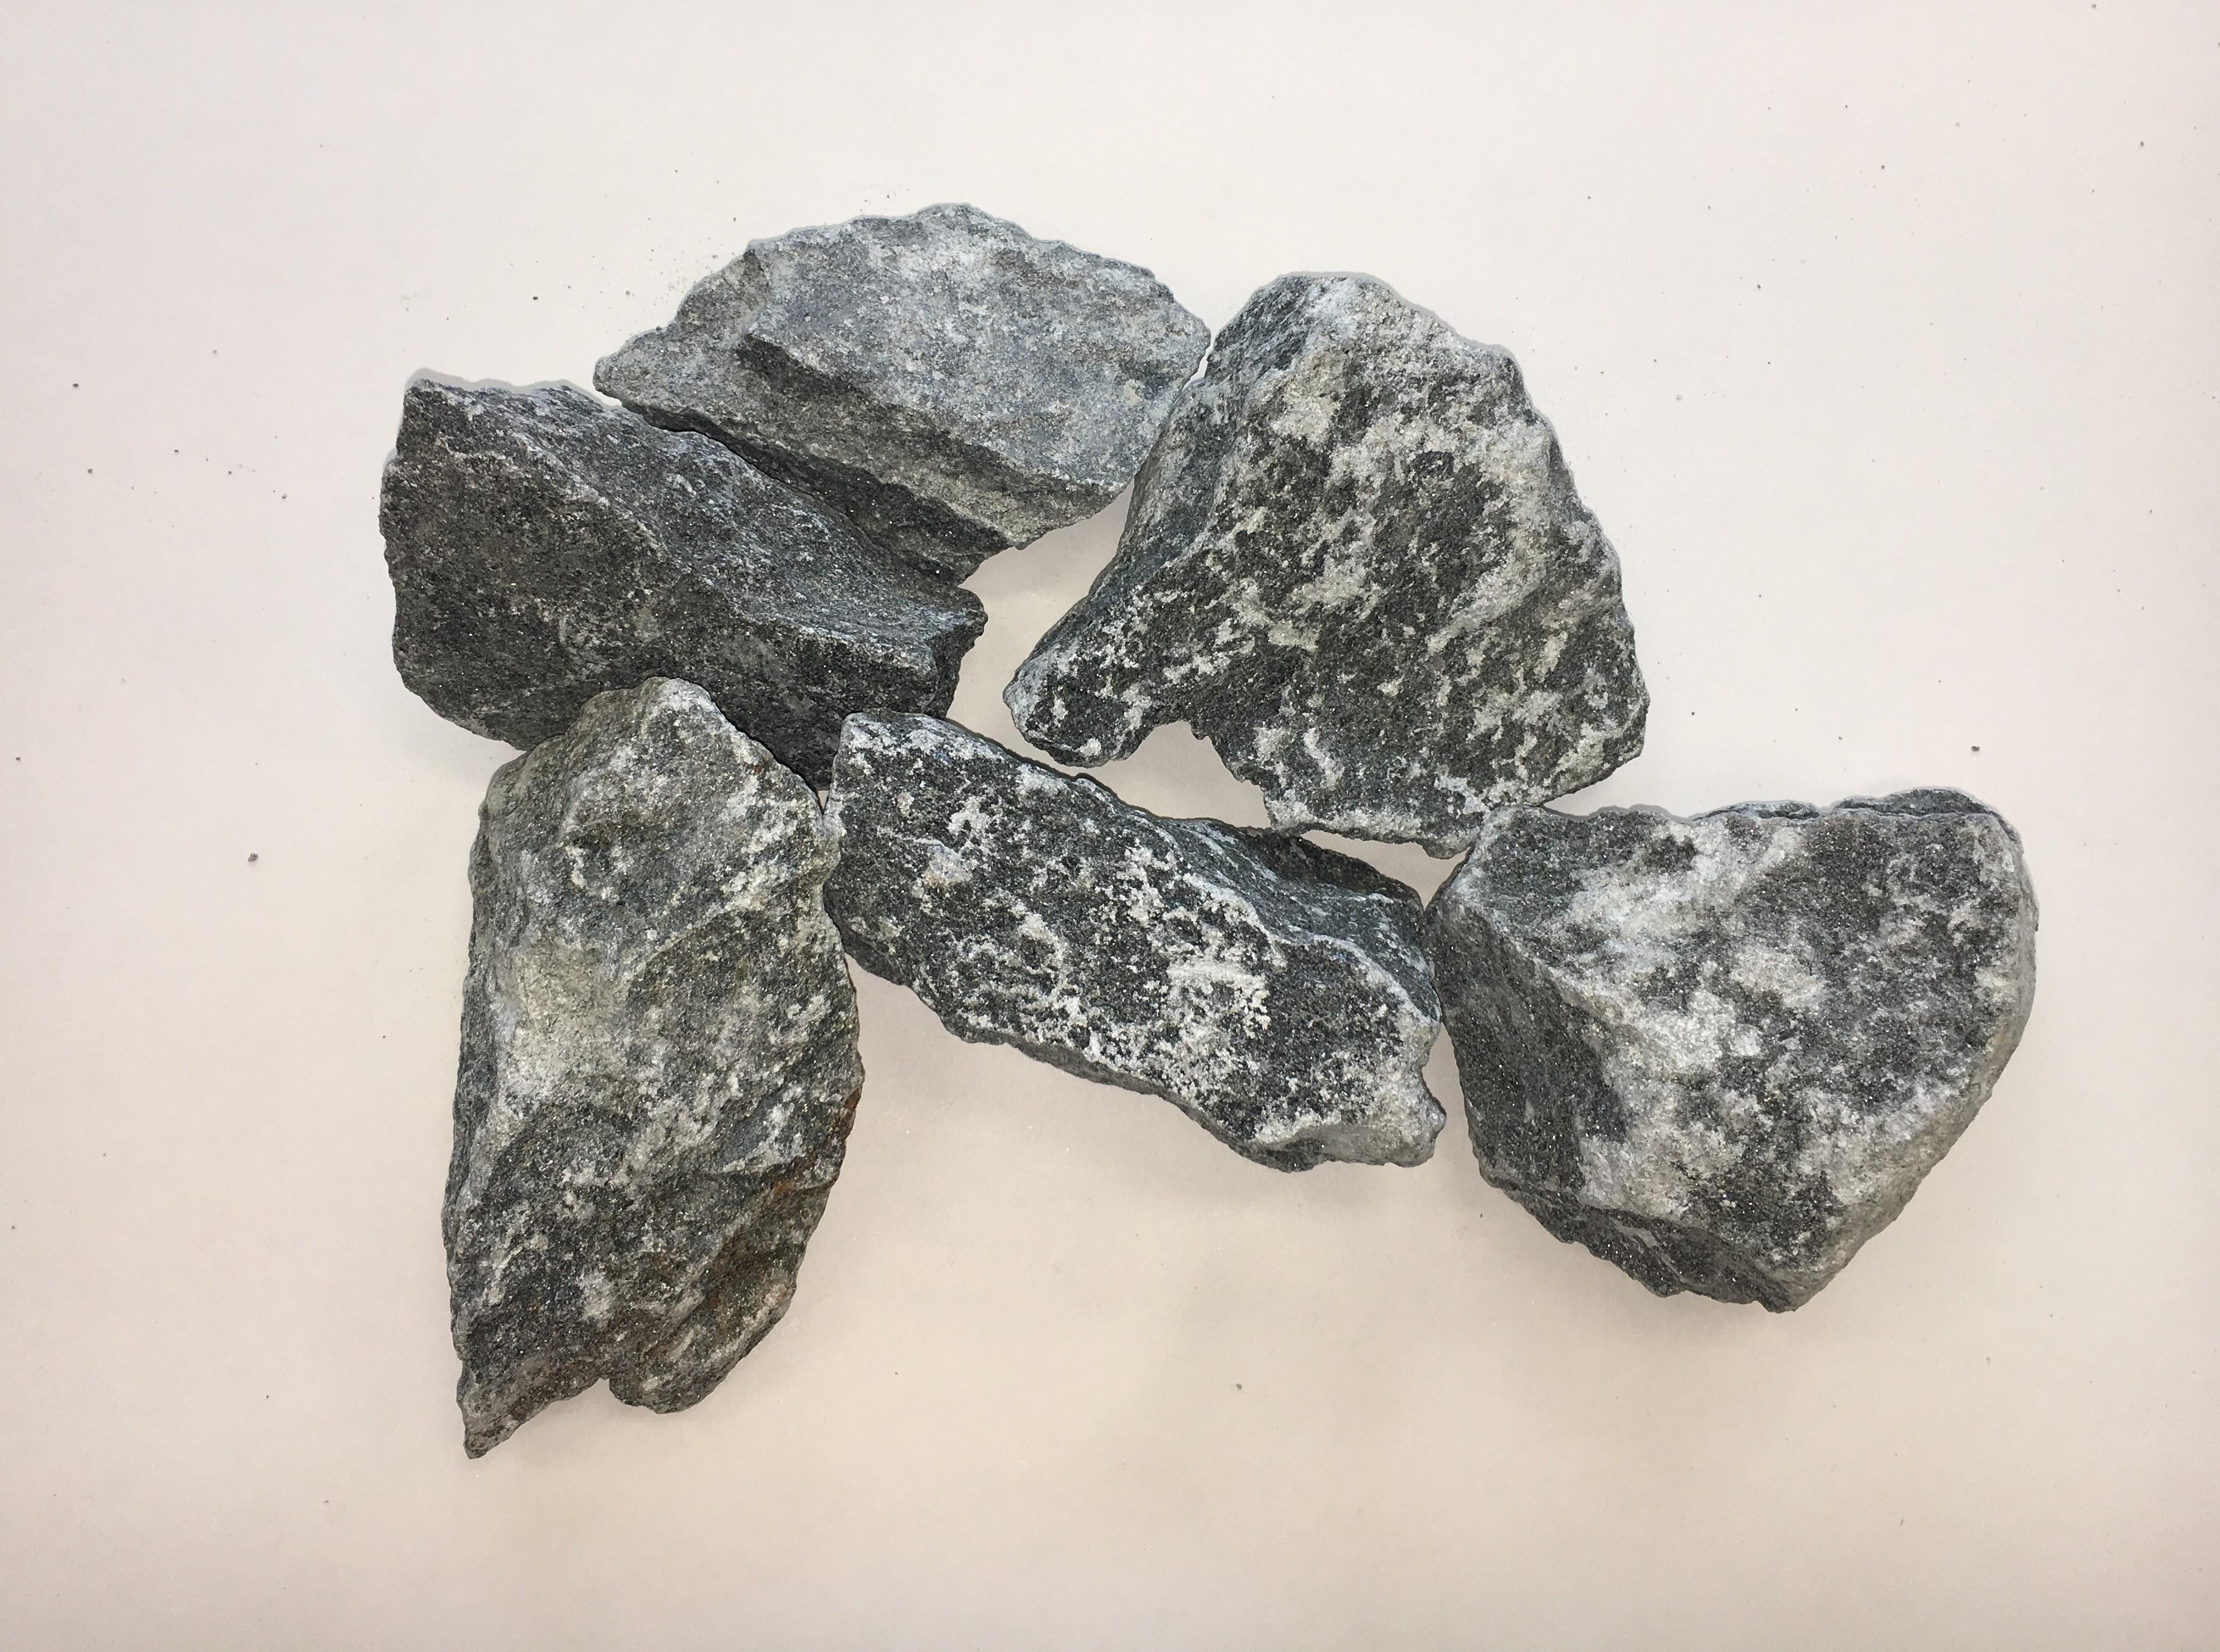 soapstone rocks